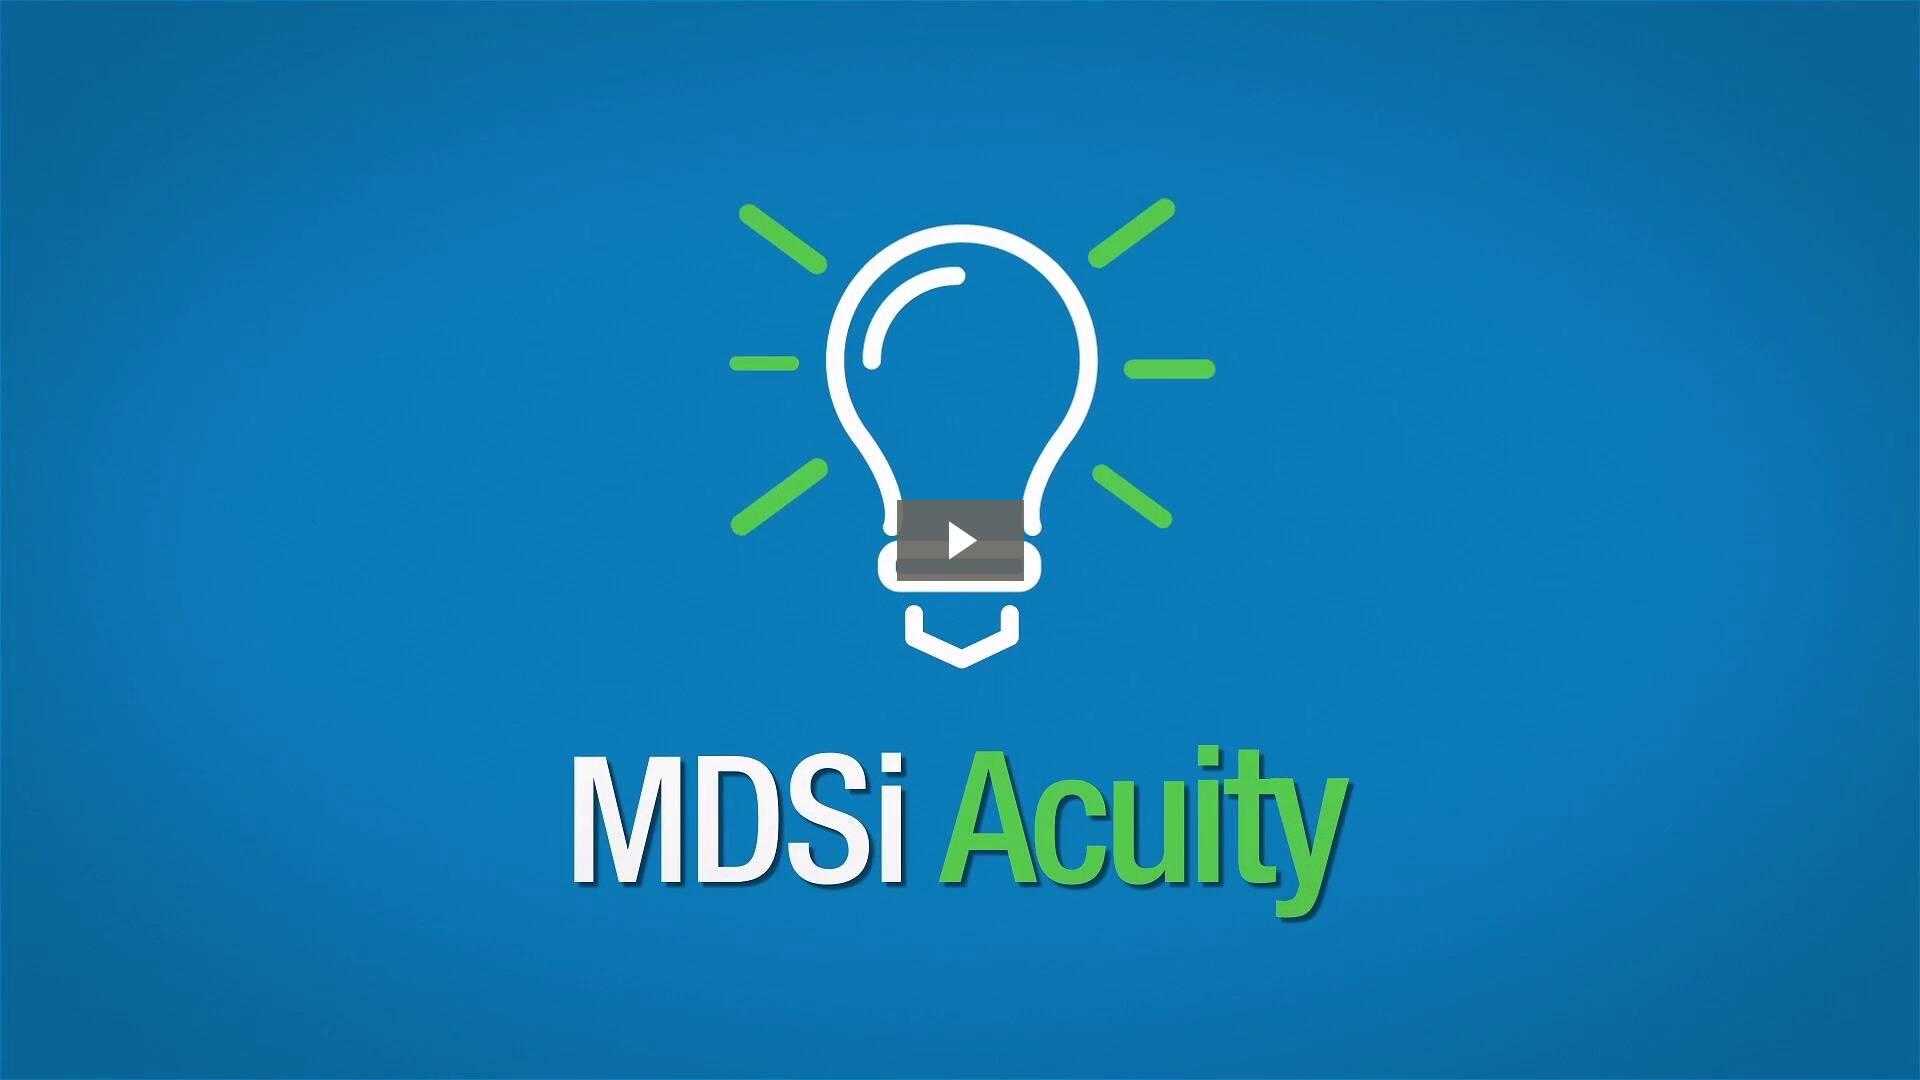 MDSi Acuity